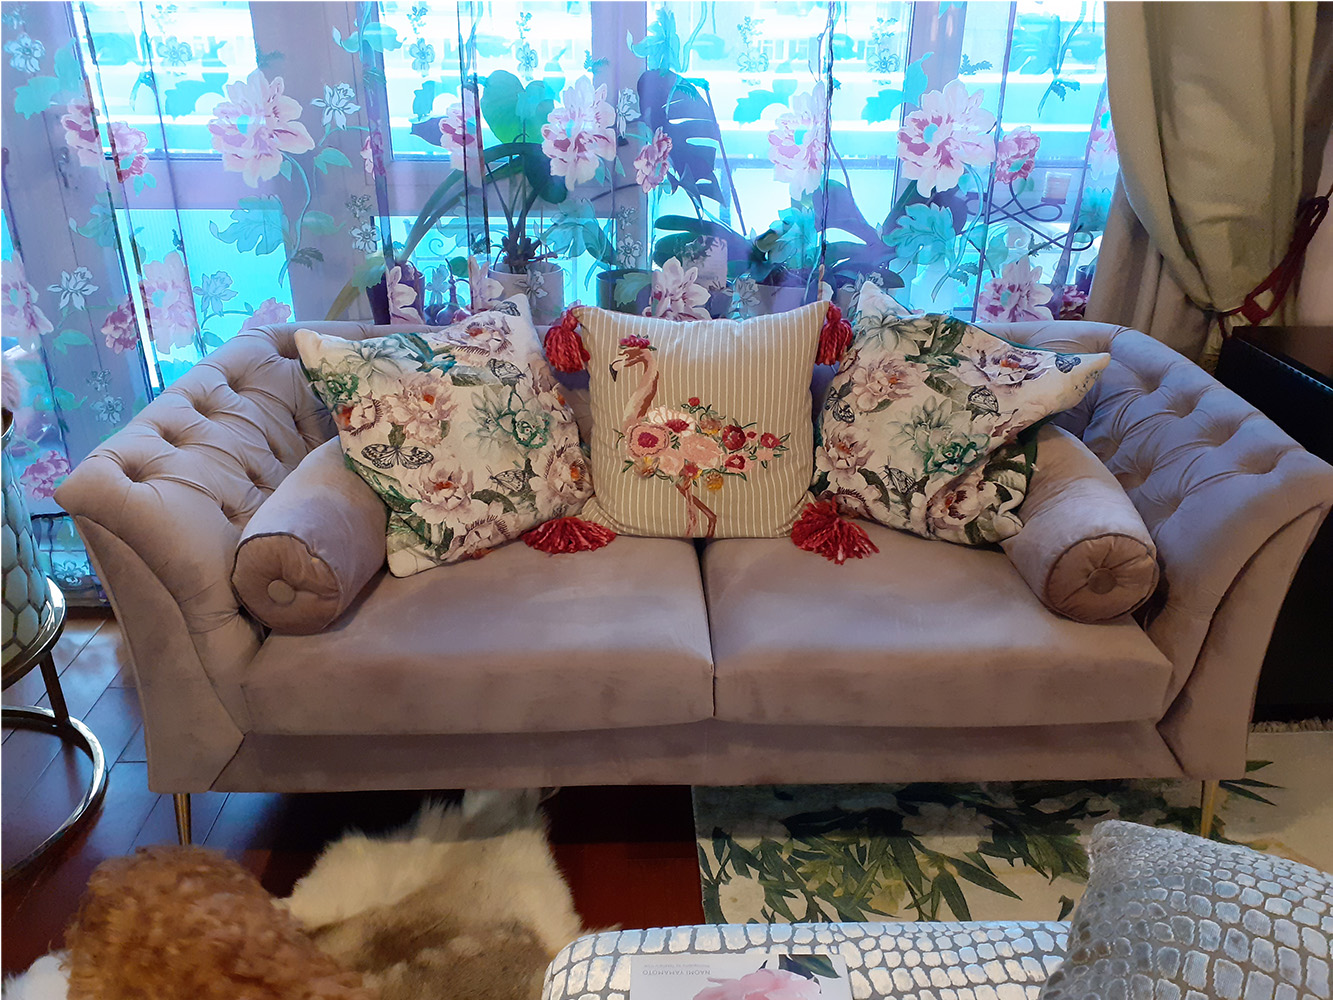 Chesterfield Modern Sofa from Natalia